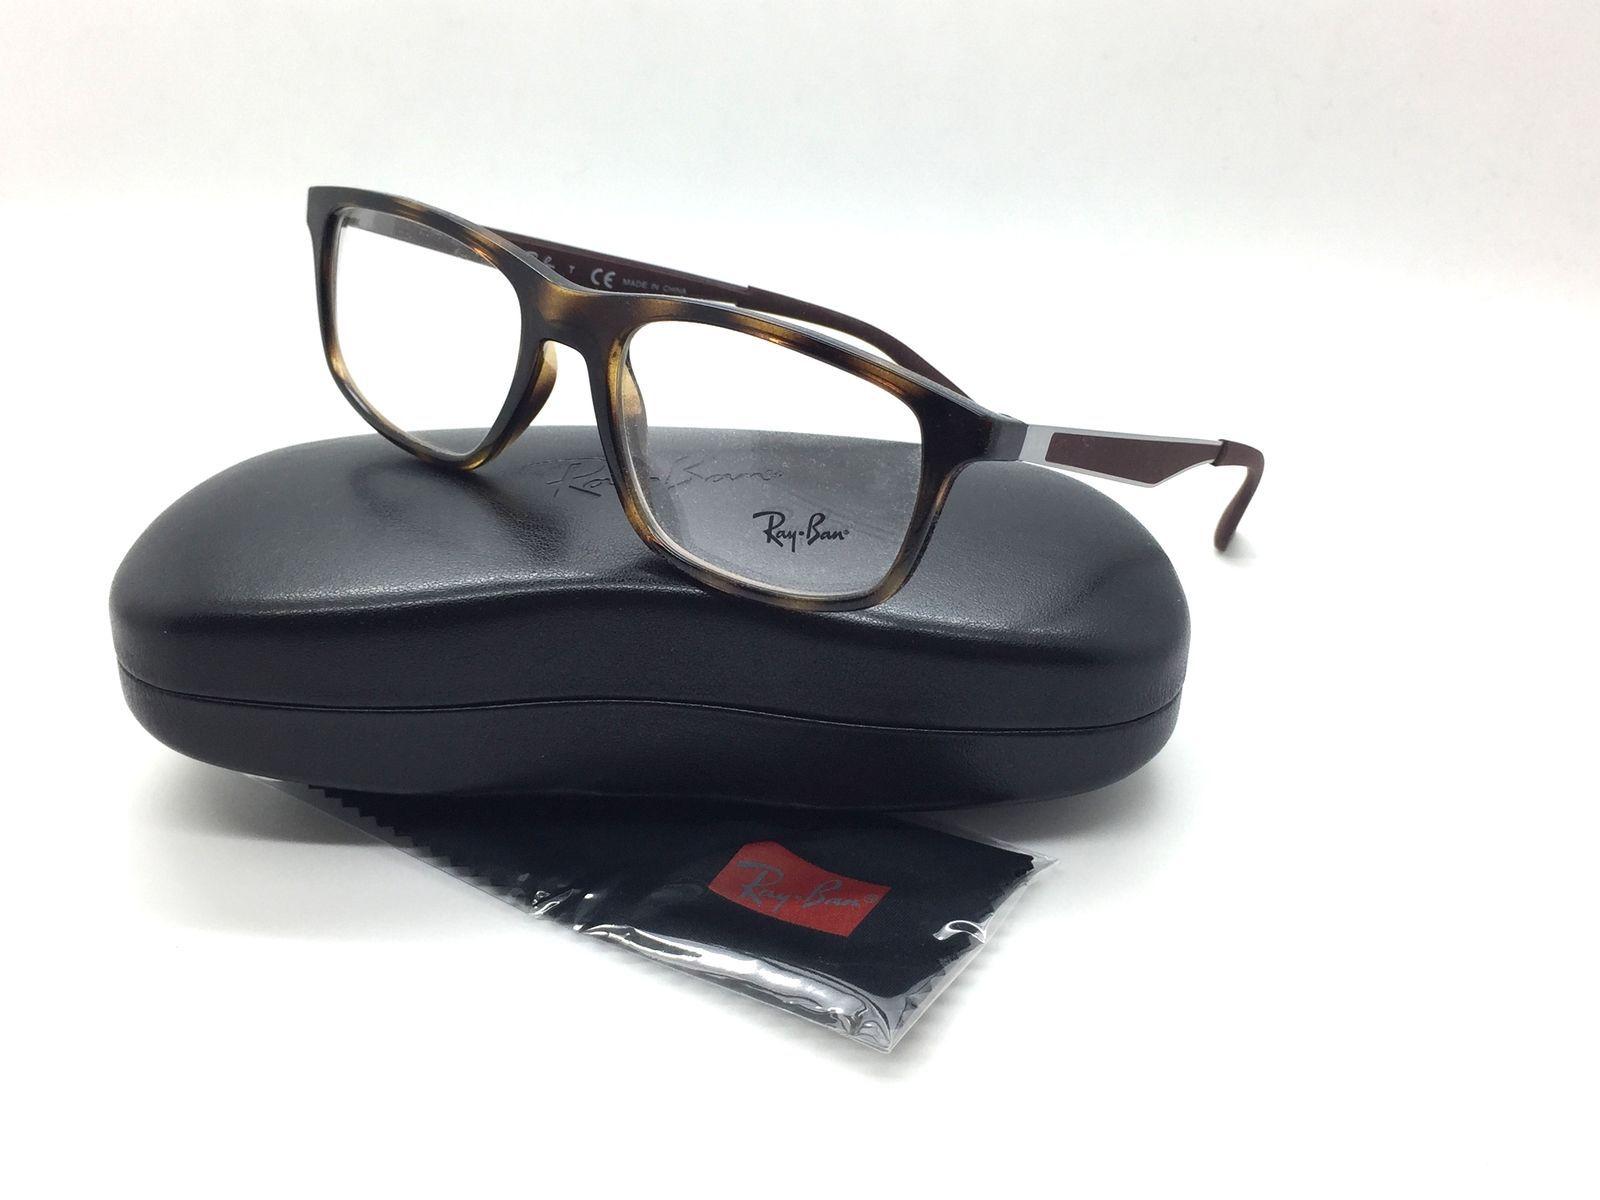 674c486470 S l1600. S l1600. Ray Ban Unisex Tortoise Square New Eyeglasses RB 7055  2012 53 Plastic. Free Shipping